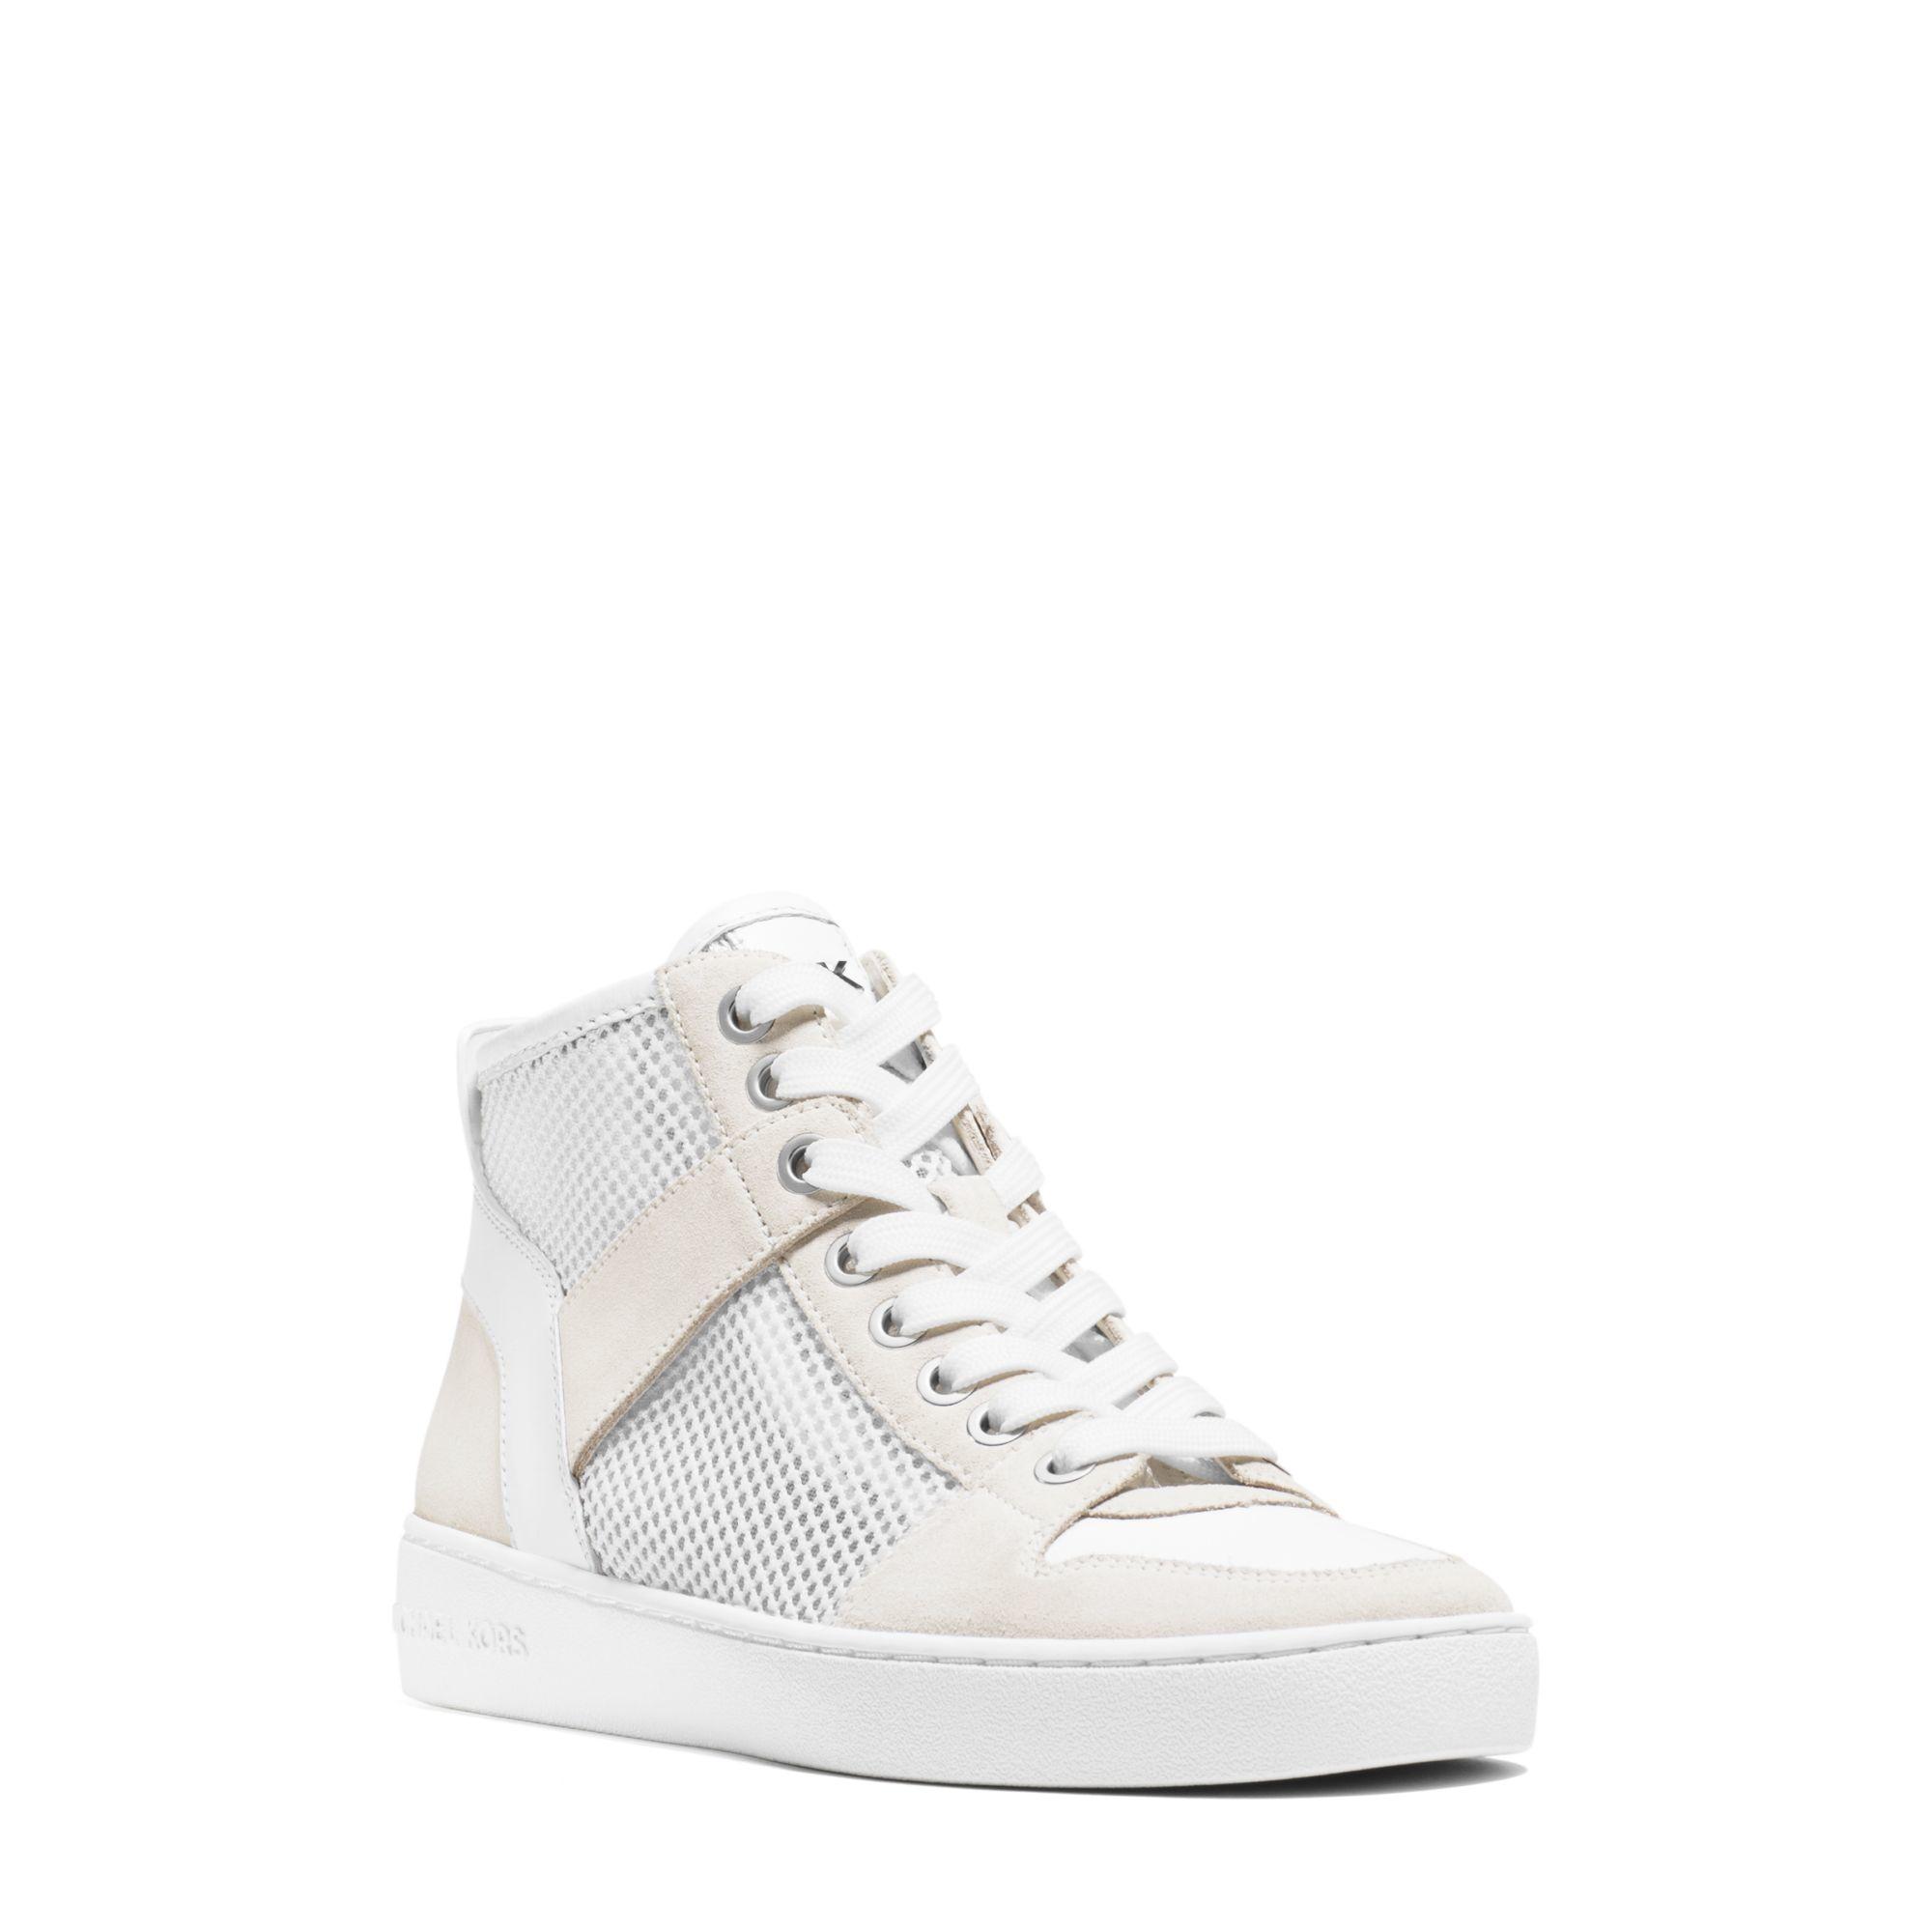 michael kors matty high top mesh sneaker in white lyst. Black Bedroom Furniture Sets. Home Design Ideas